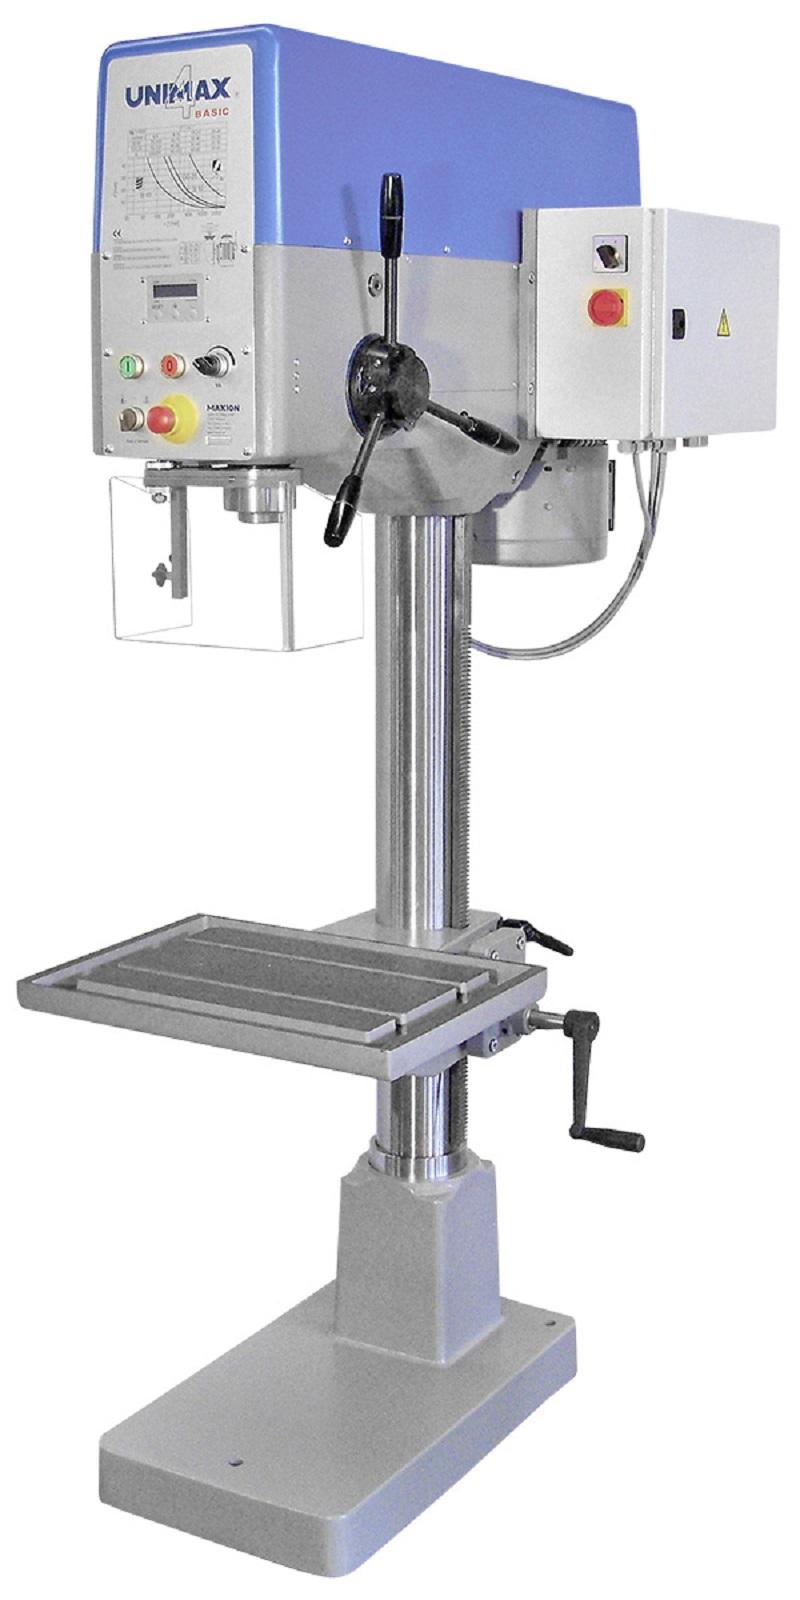 MAXION Säulenbohrmaschine UNIMAX 4 Basic